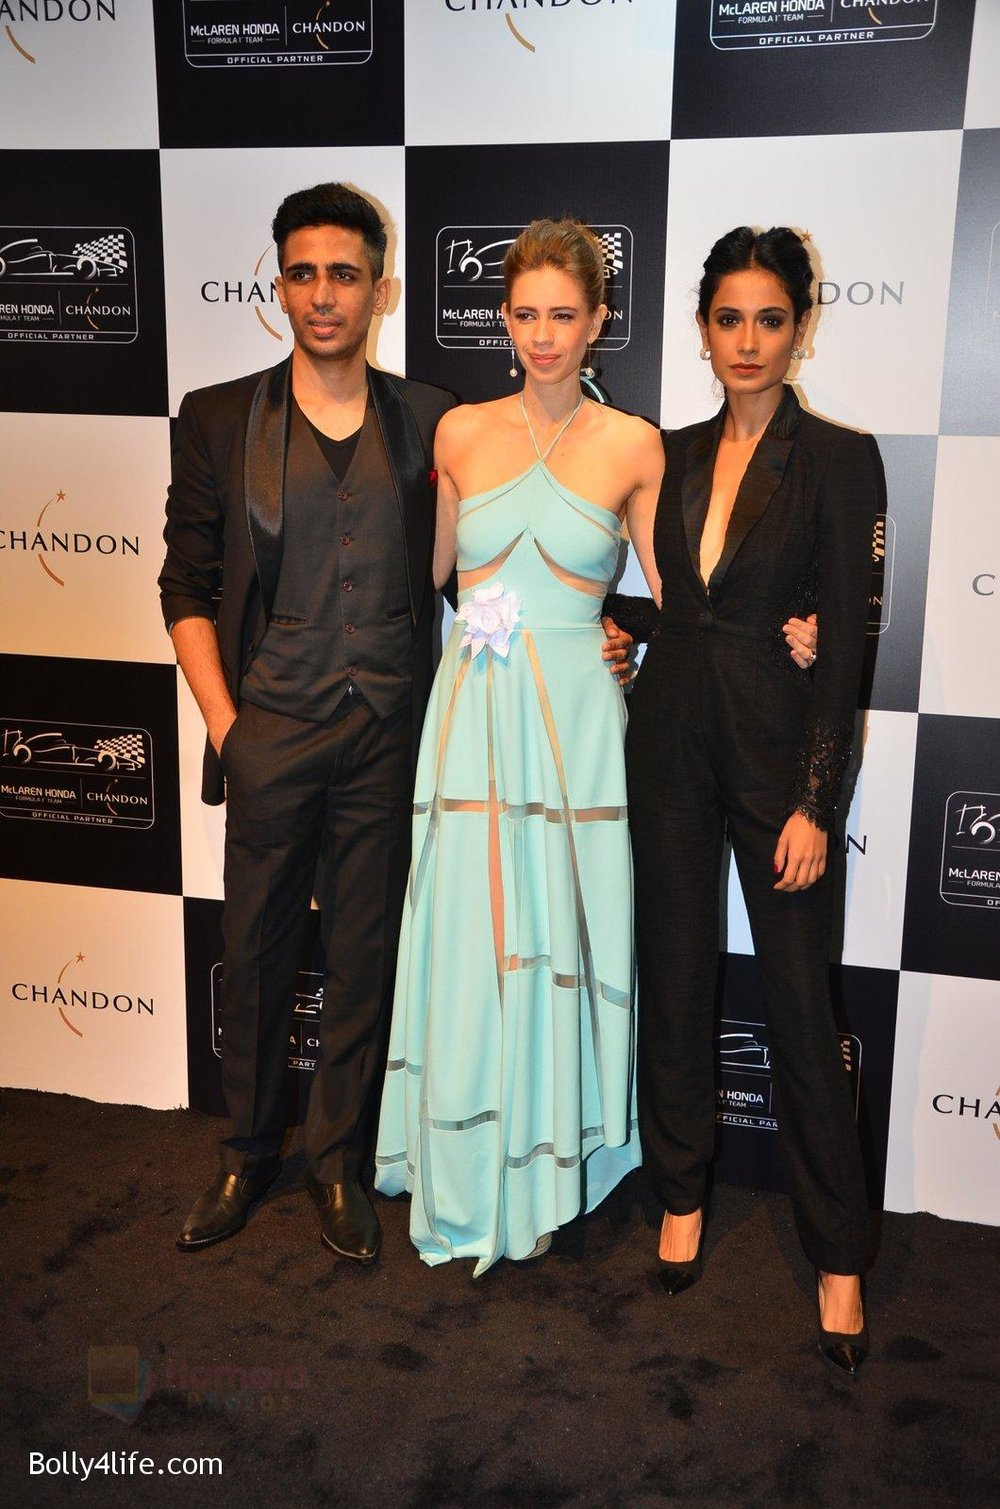 Gulshan-Devaiya-Kalki-Koechlin-Sarah-Jane-Dias-at-the-unveiling-Chandon-X-McLaren-Honda-installation-in-Mumbai-on-9th-Sept-2016-46.jpg